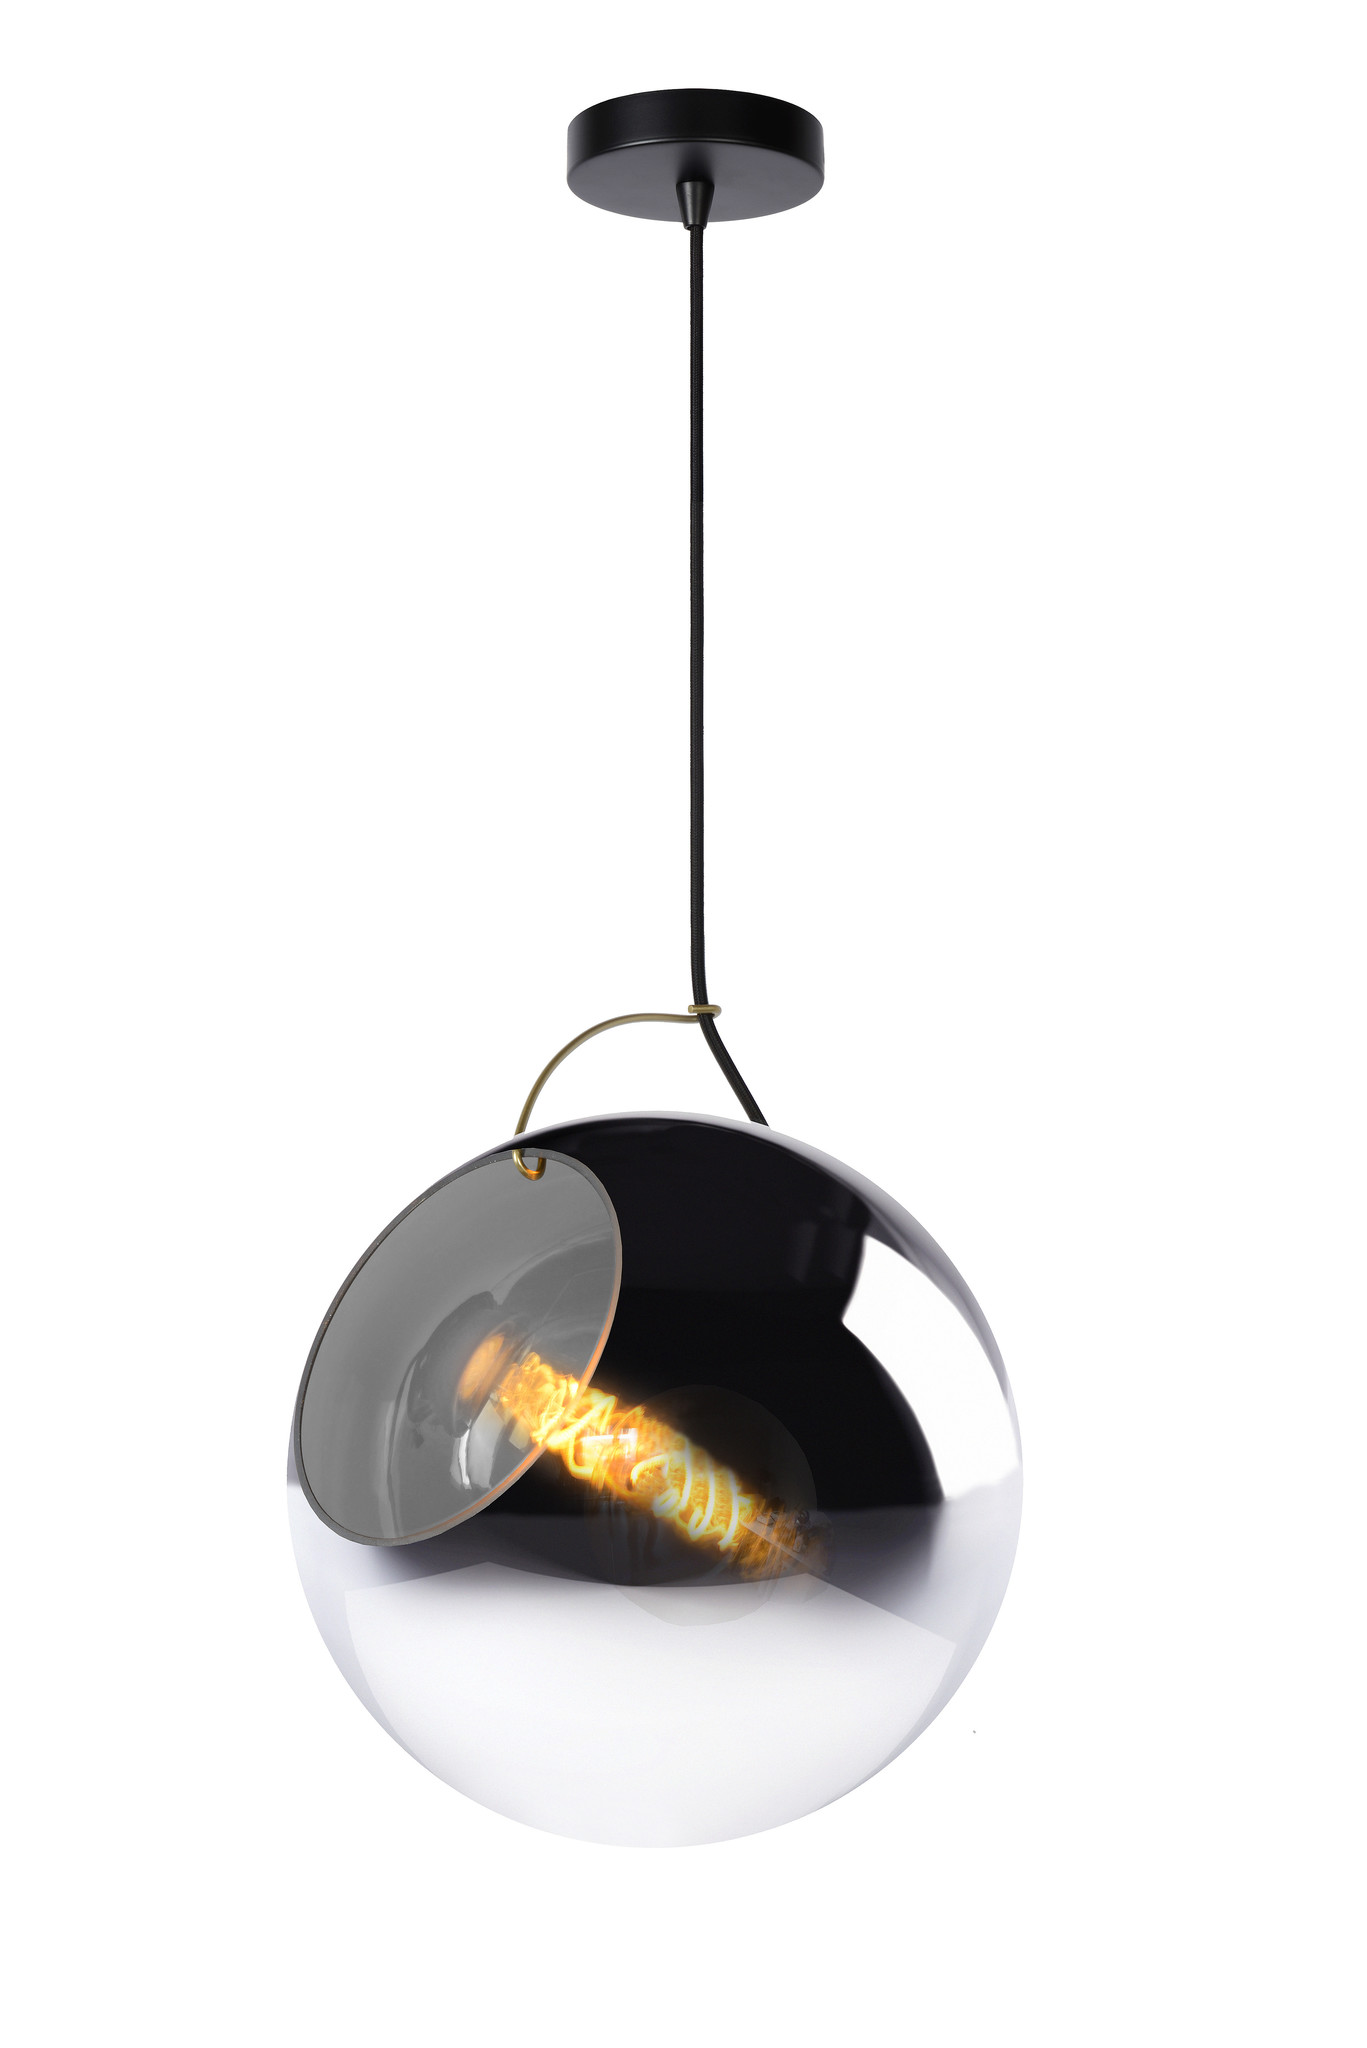 Lucide JAZZLYNN Hanglamp-Fumé-Ø30-1xE27-60W-Glas